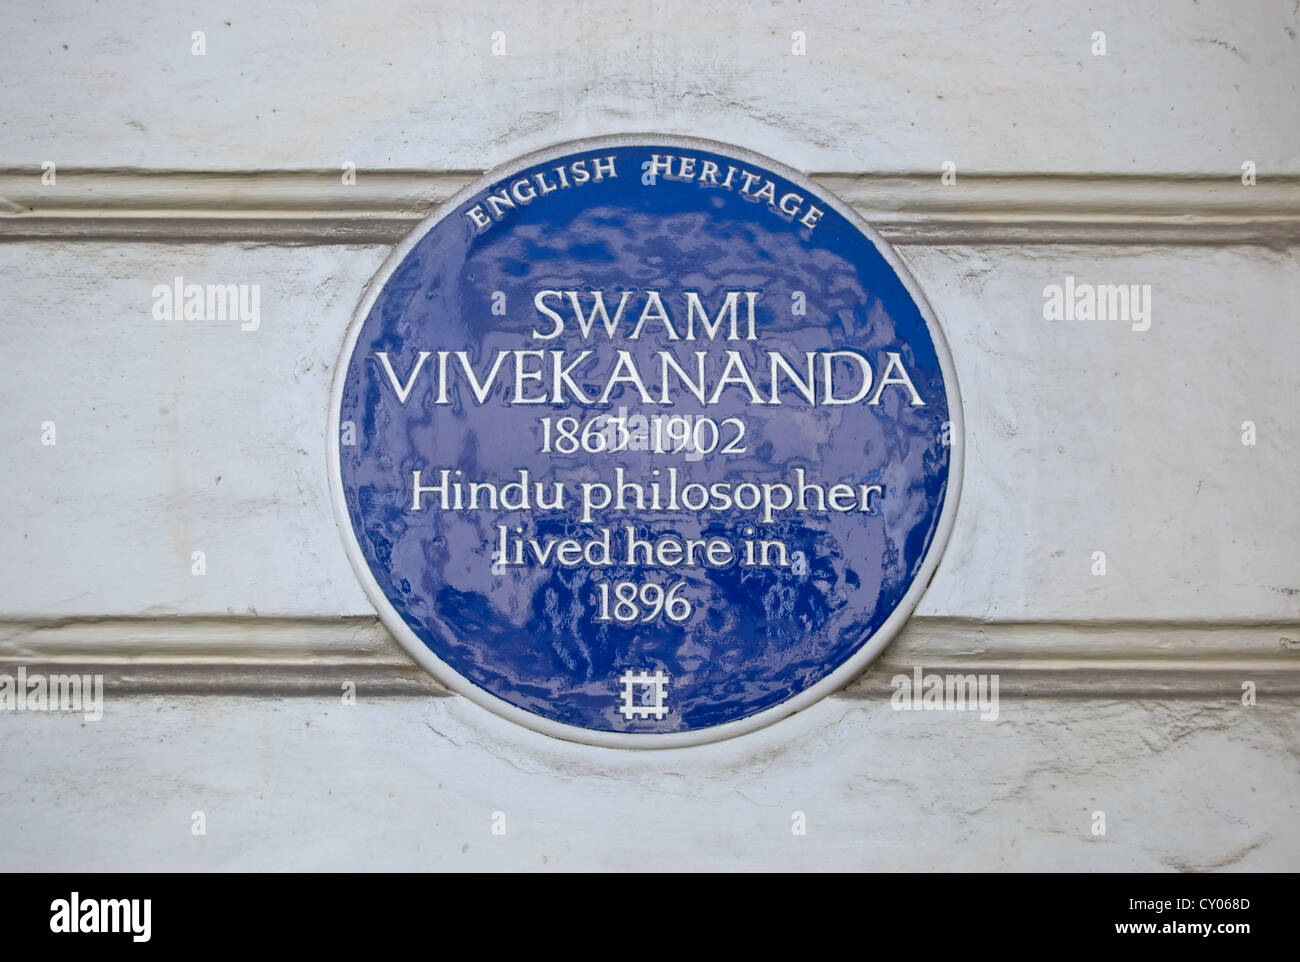 english heritage blue plaque marking the 1896 home of hindu philosopher, swami vivekananda, pimlico, london, england - Stock Image